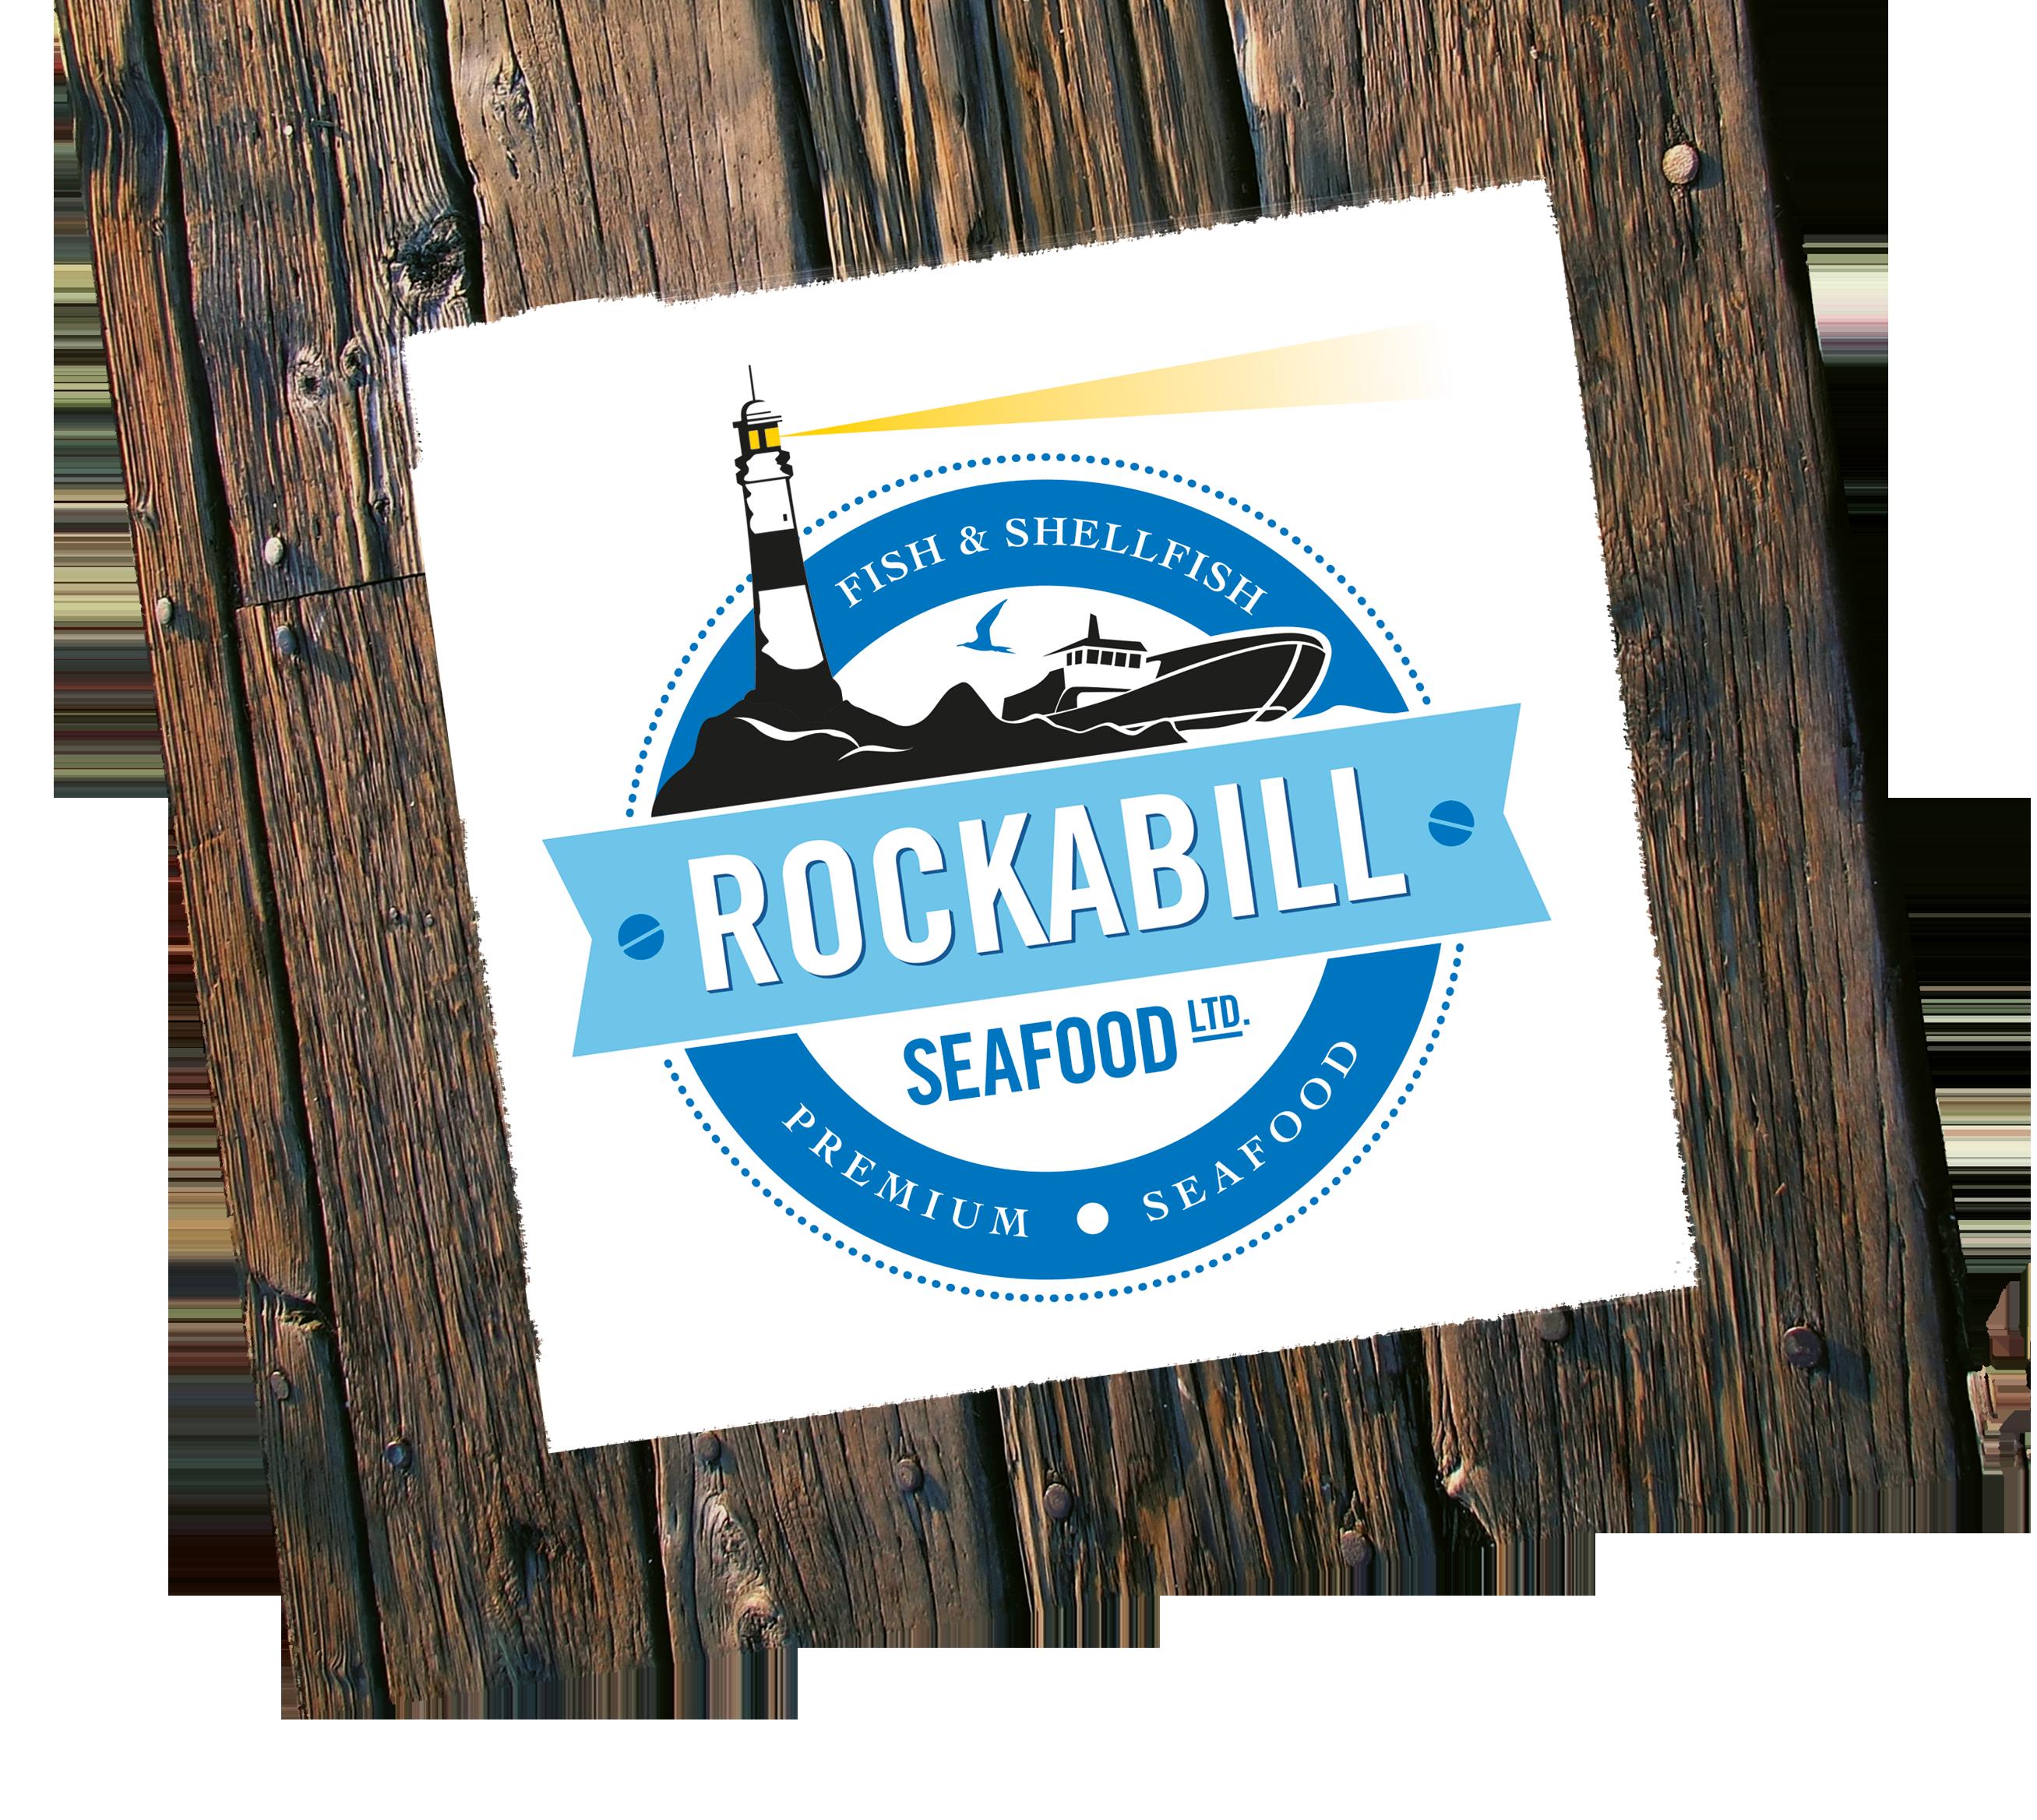 Image of Rockabill Seafood Ltd logotype